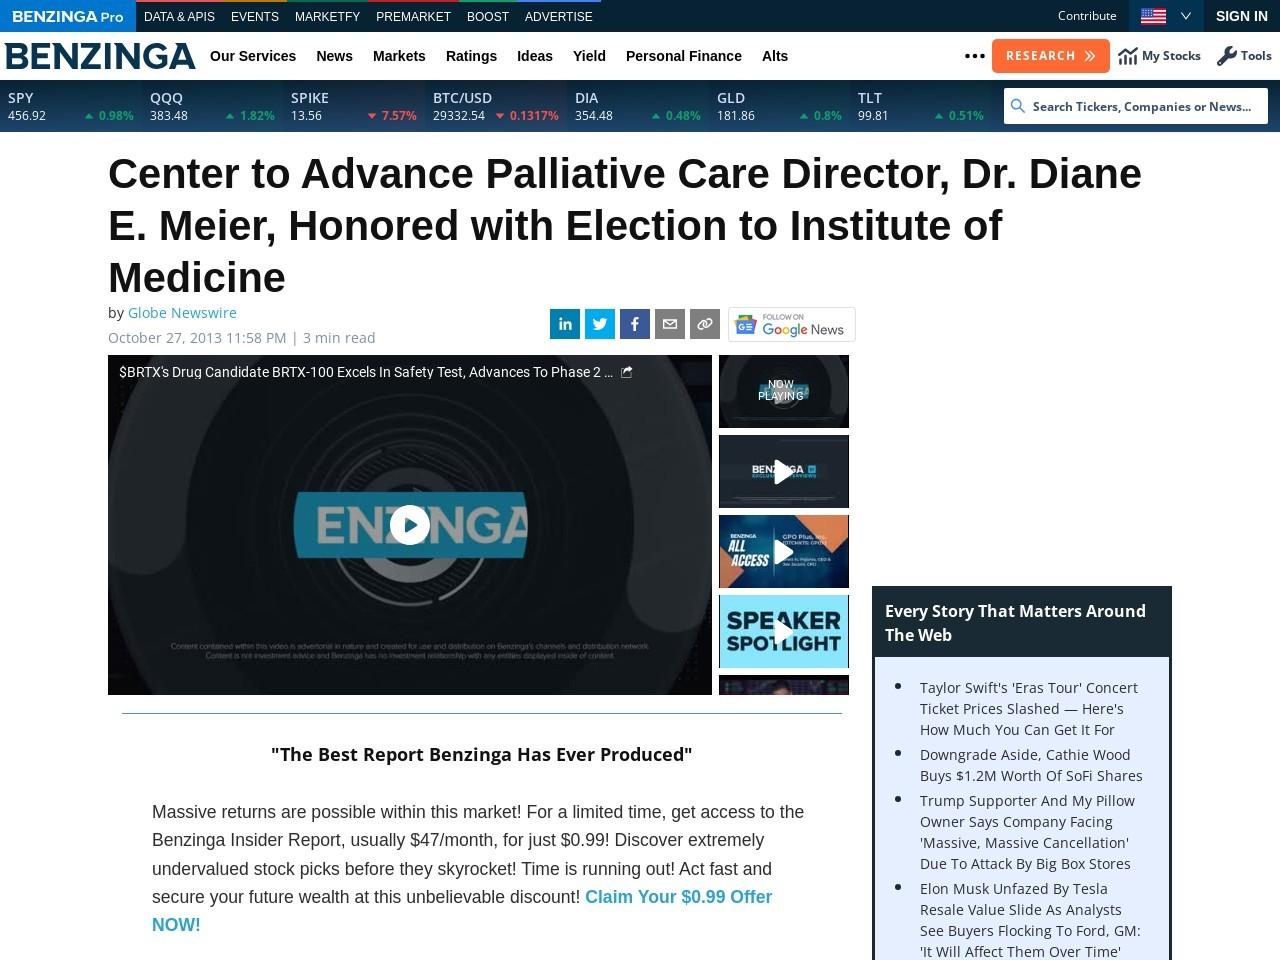 Center to Advance Palliative Care Director, Dr. Diane E. Meier, Honored…